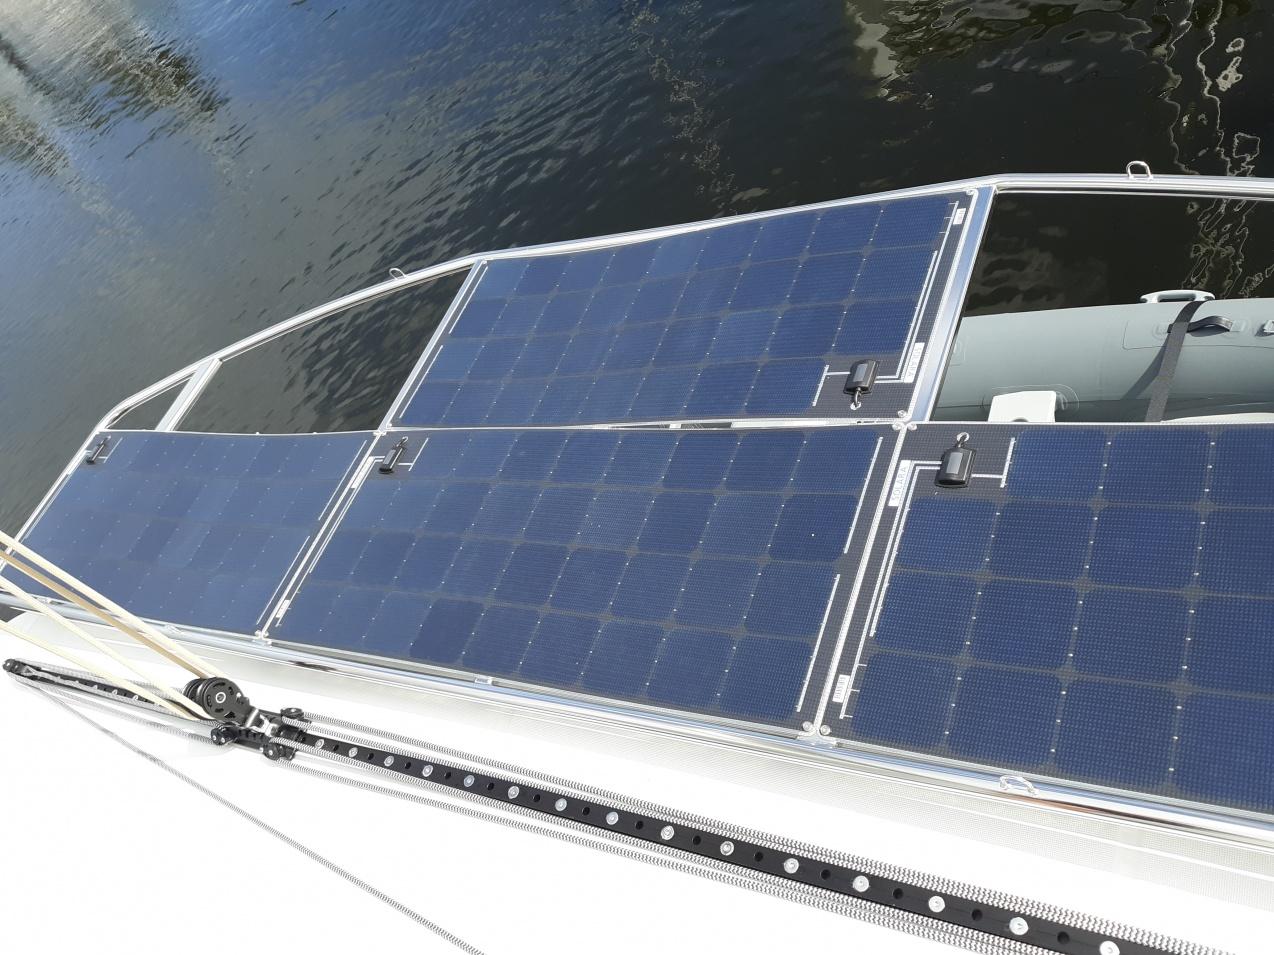 Click image for larger version  Name:Tiltable solar.jpg Views:78 Size:416.2 KB ID:185070